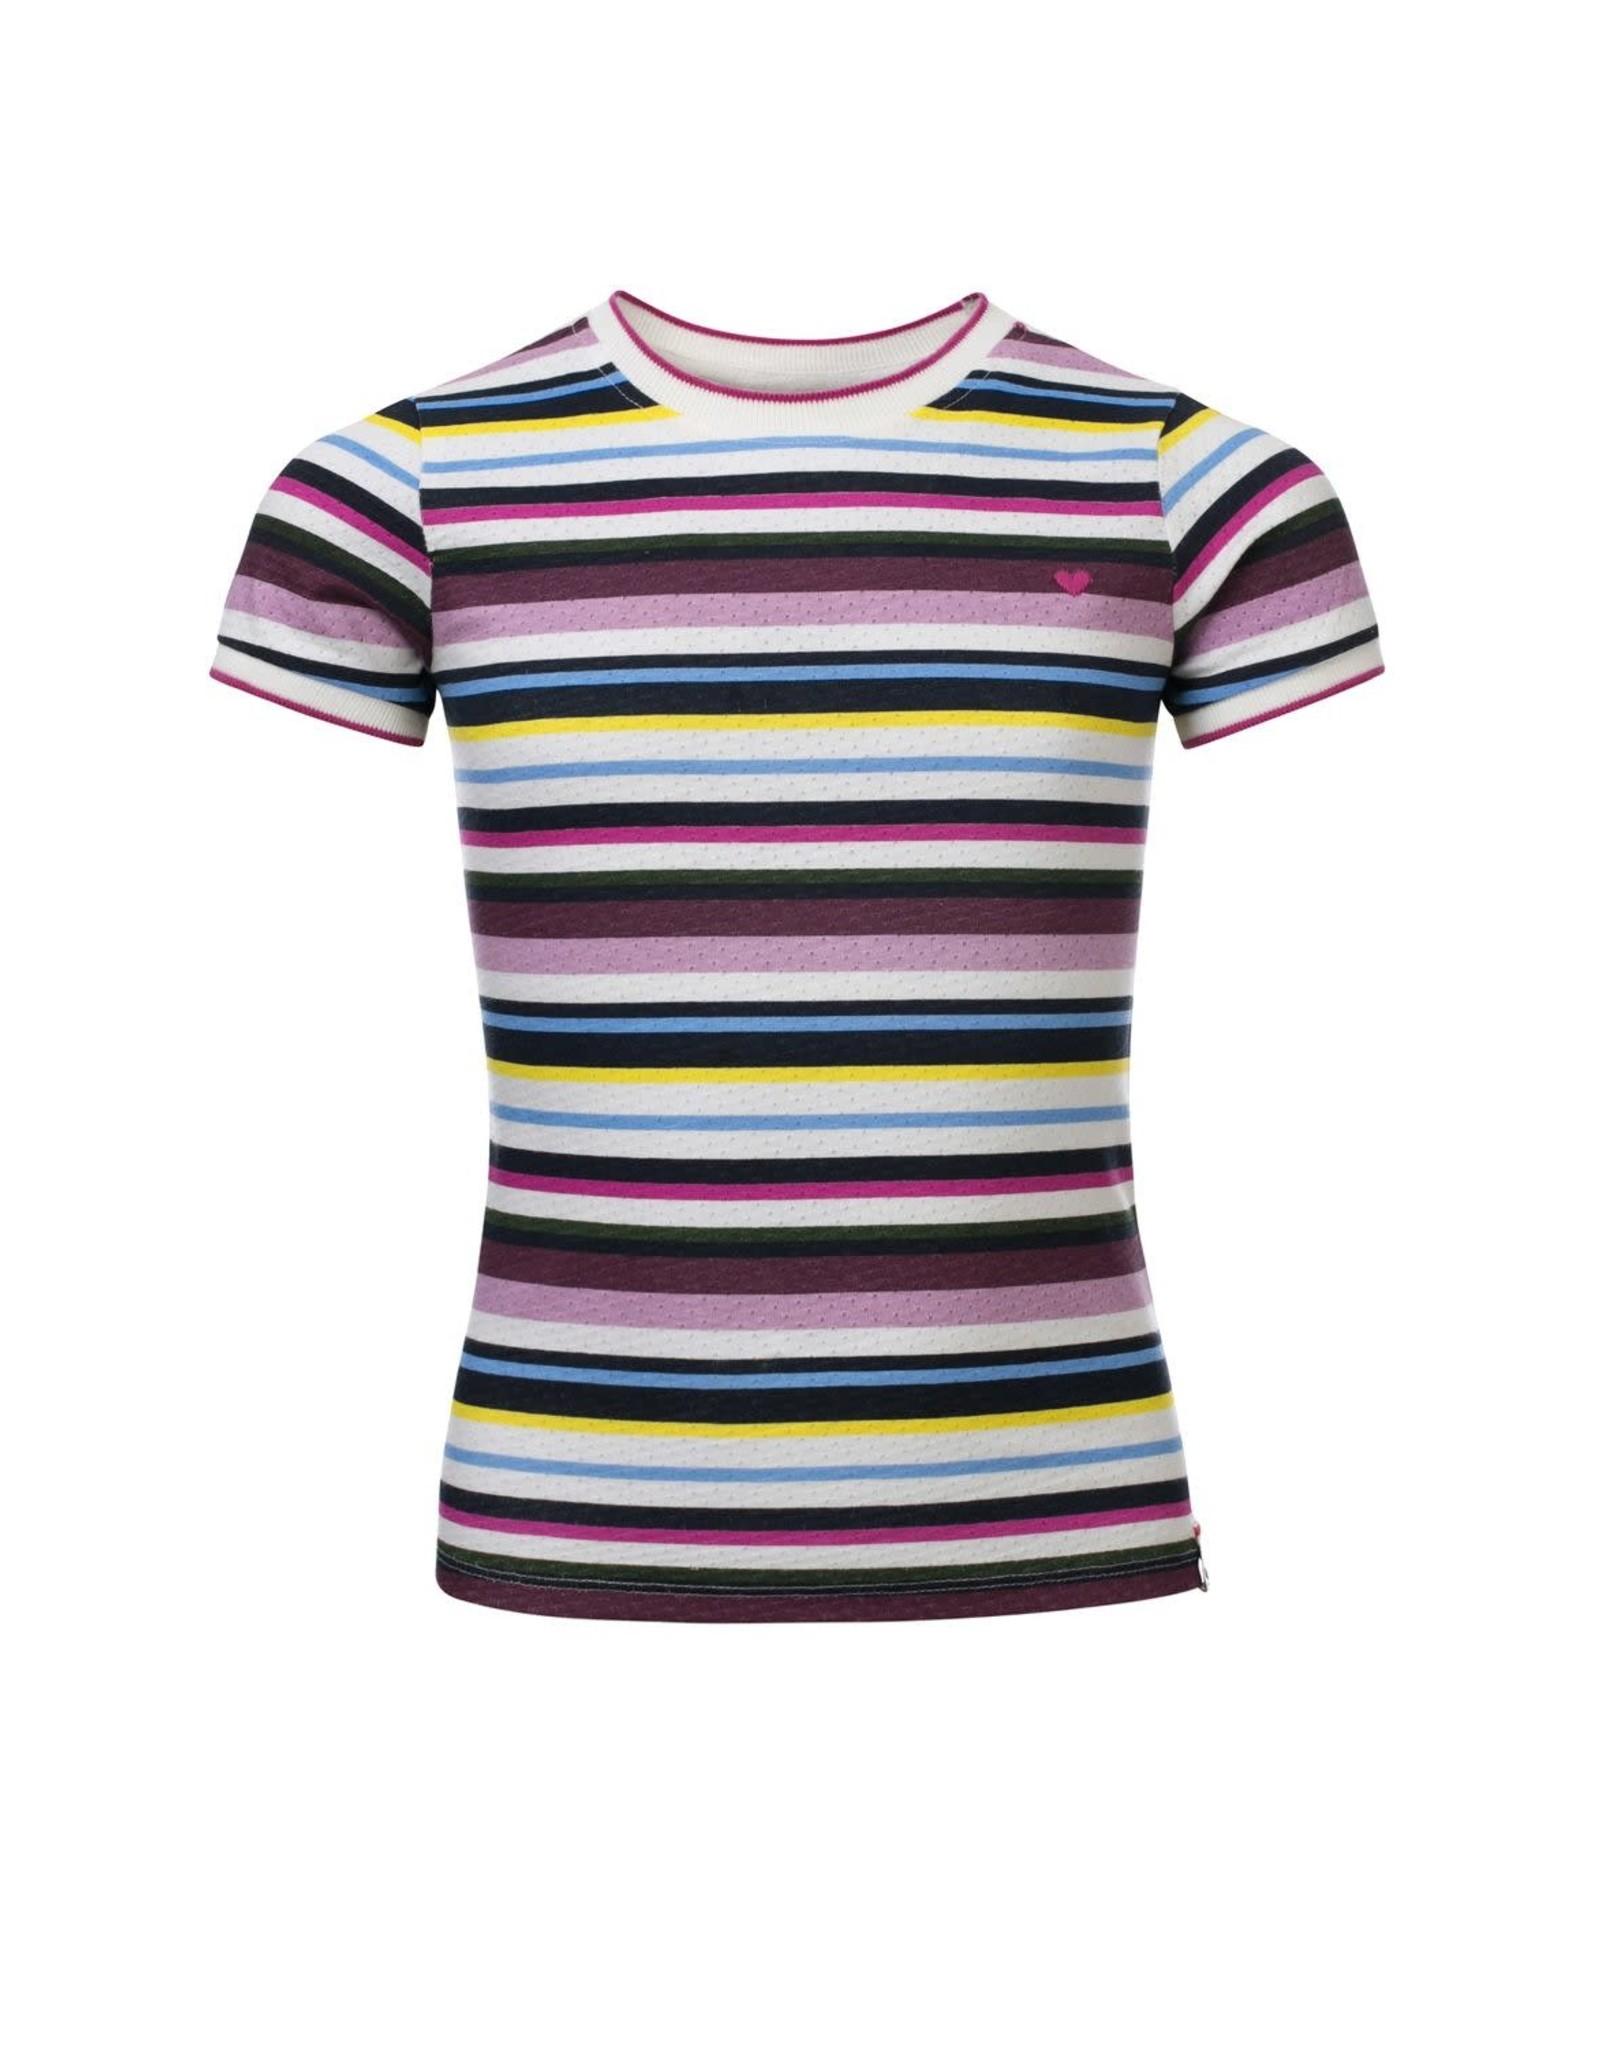 Looxs Girls T-shirt s/s multi colour